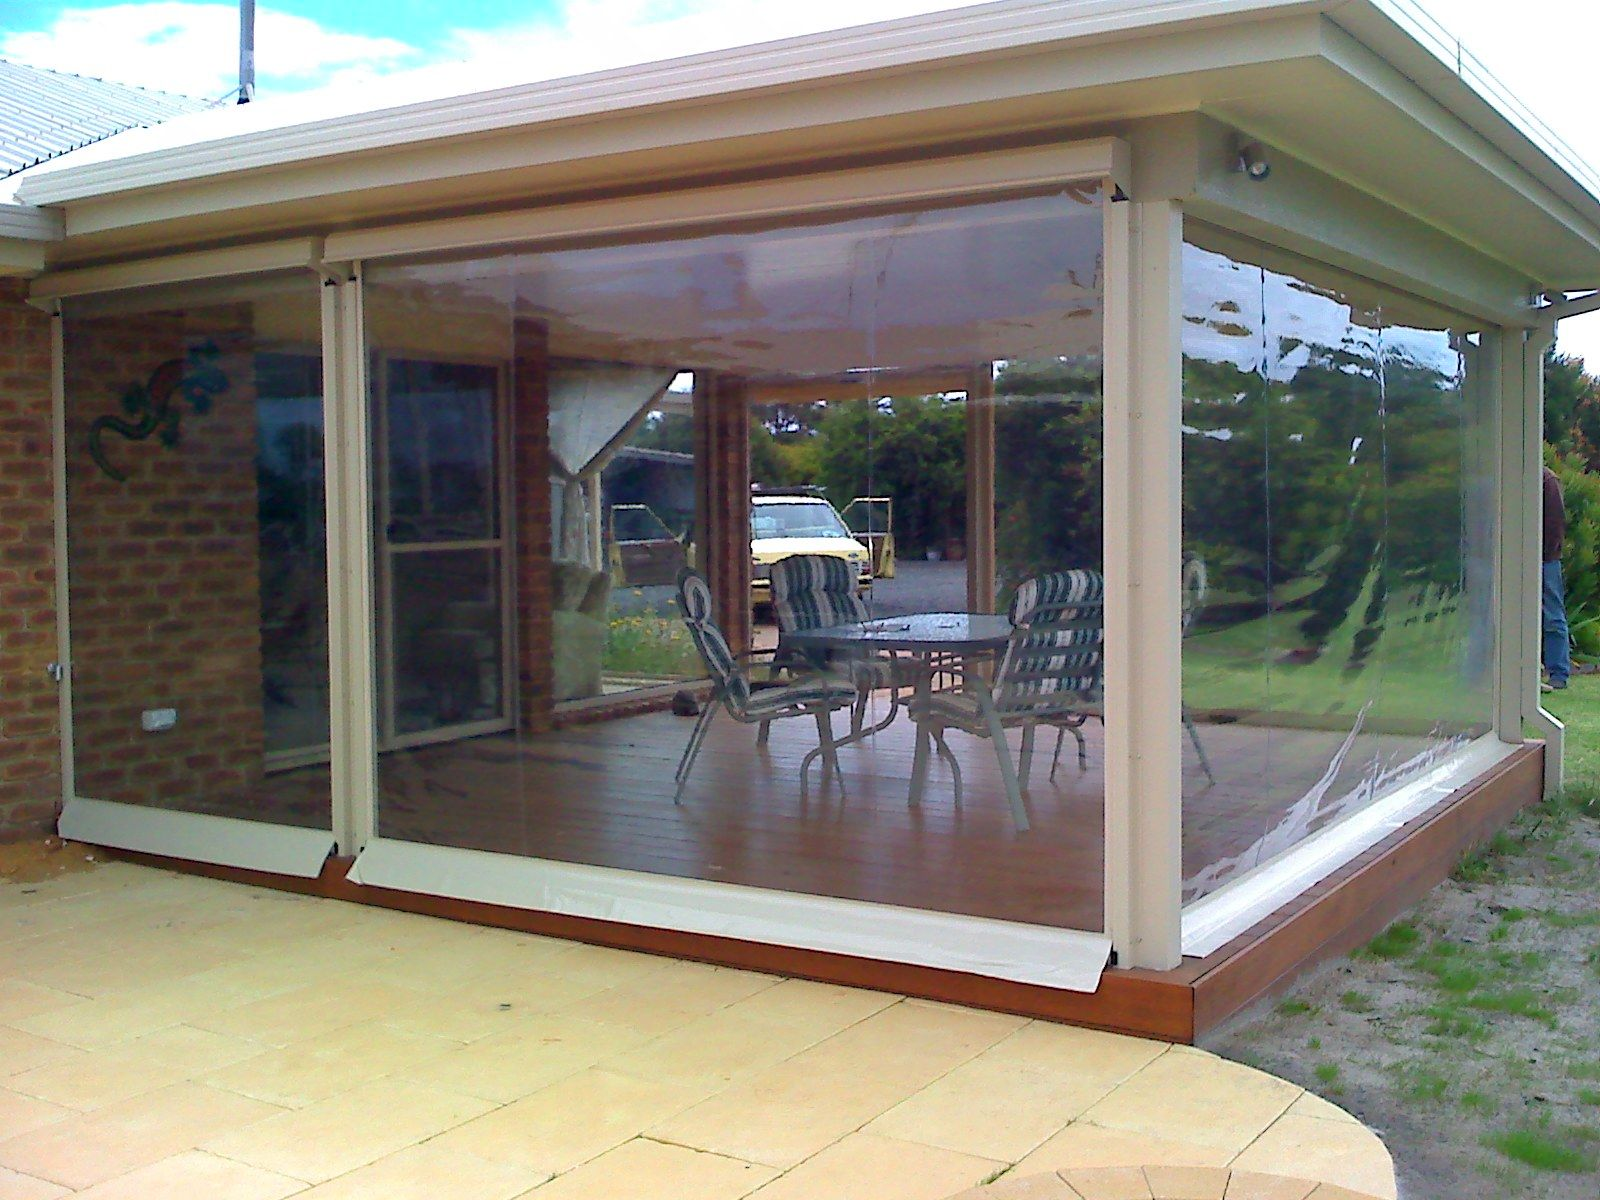 Get outdoor pvc blinds outdoorpvcblinds outdoor blinds awnings get outdoor pvc blinds outdoorpvcblinds solutioingenieria Gallery